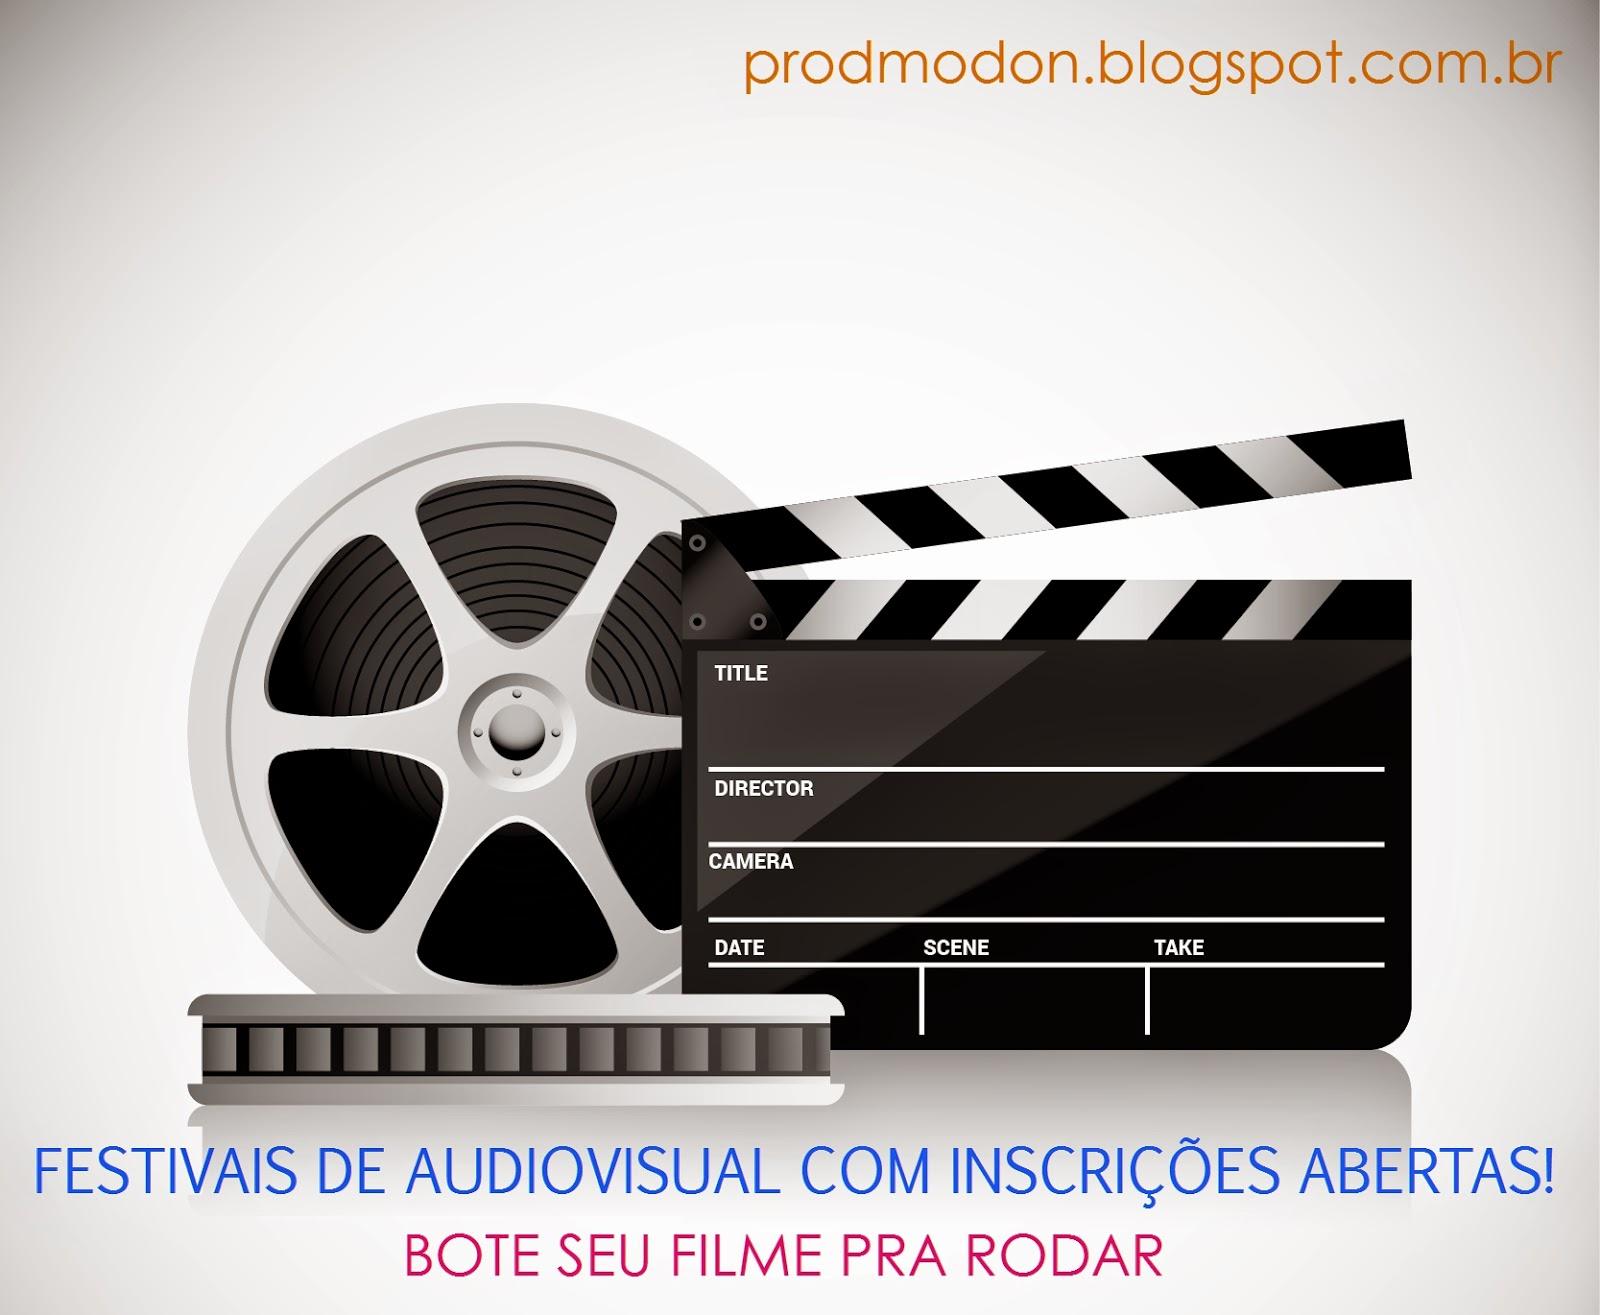 BOTE SEU FILME PRA RODAR